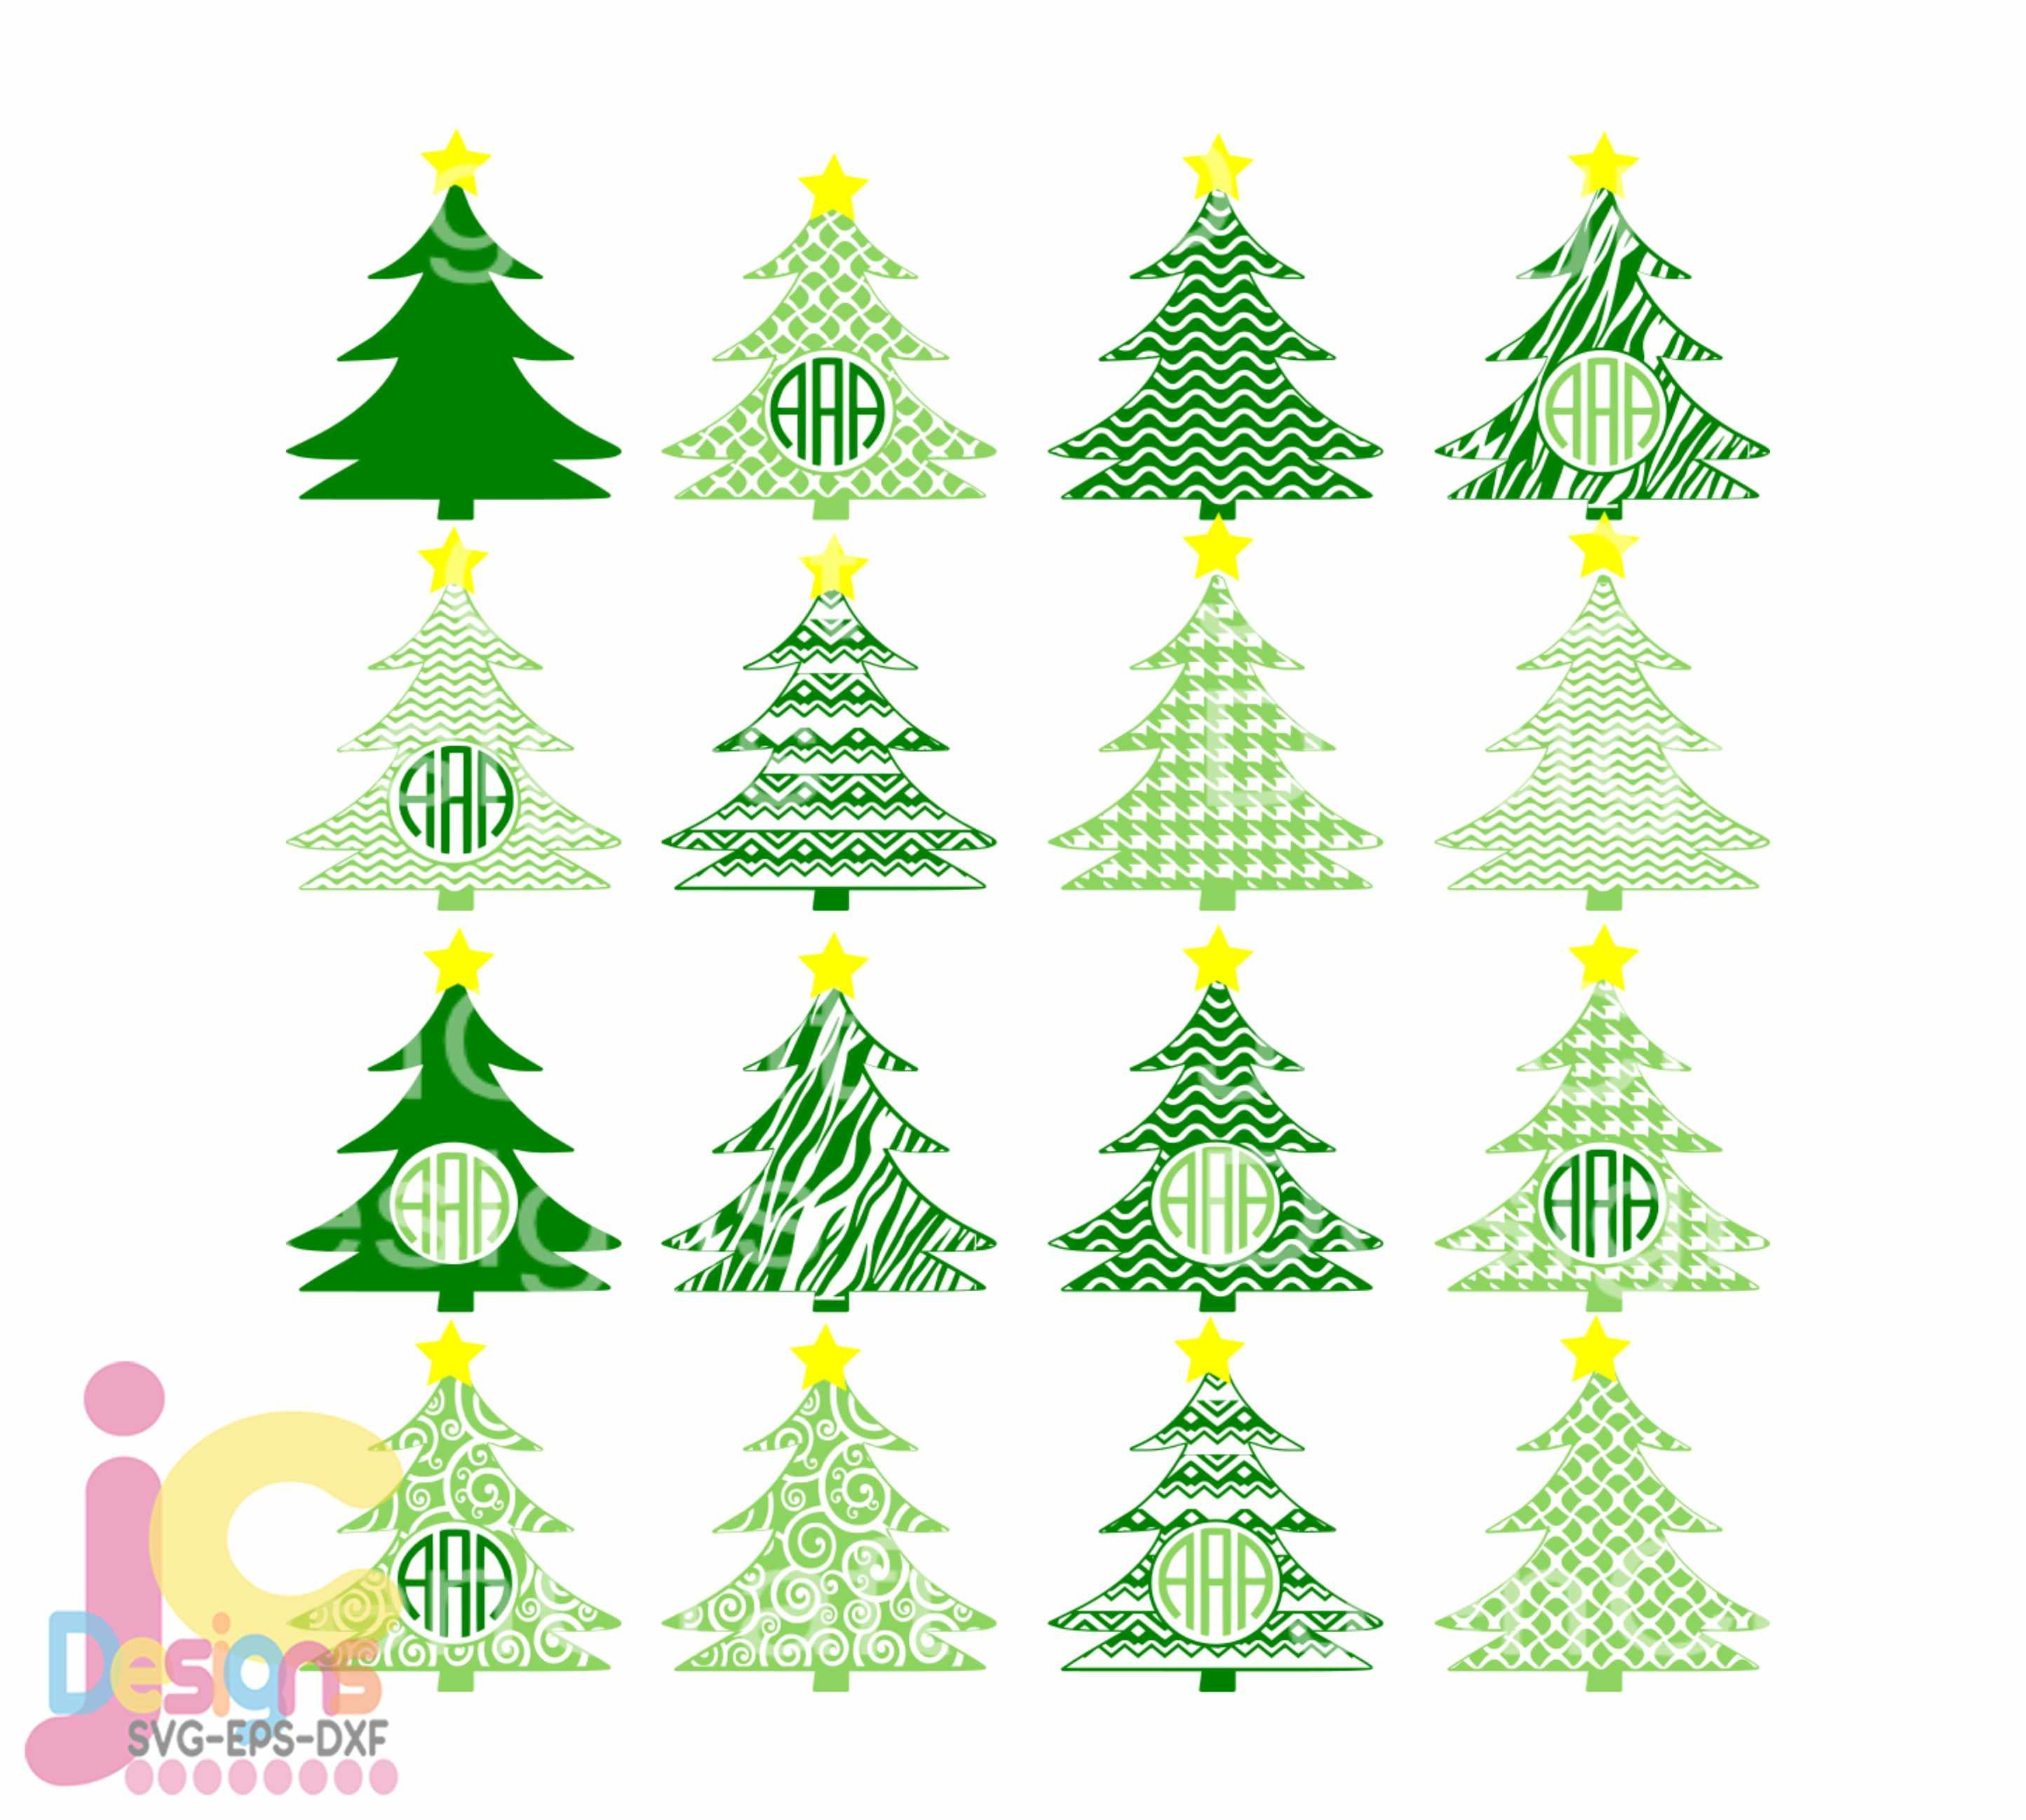 Christmas Svg Tree Svg Monogram Frames Svg Svg Eps Png Dxf Cricut Design Space Silhouette Studio Digital Cut Files Printable